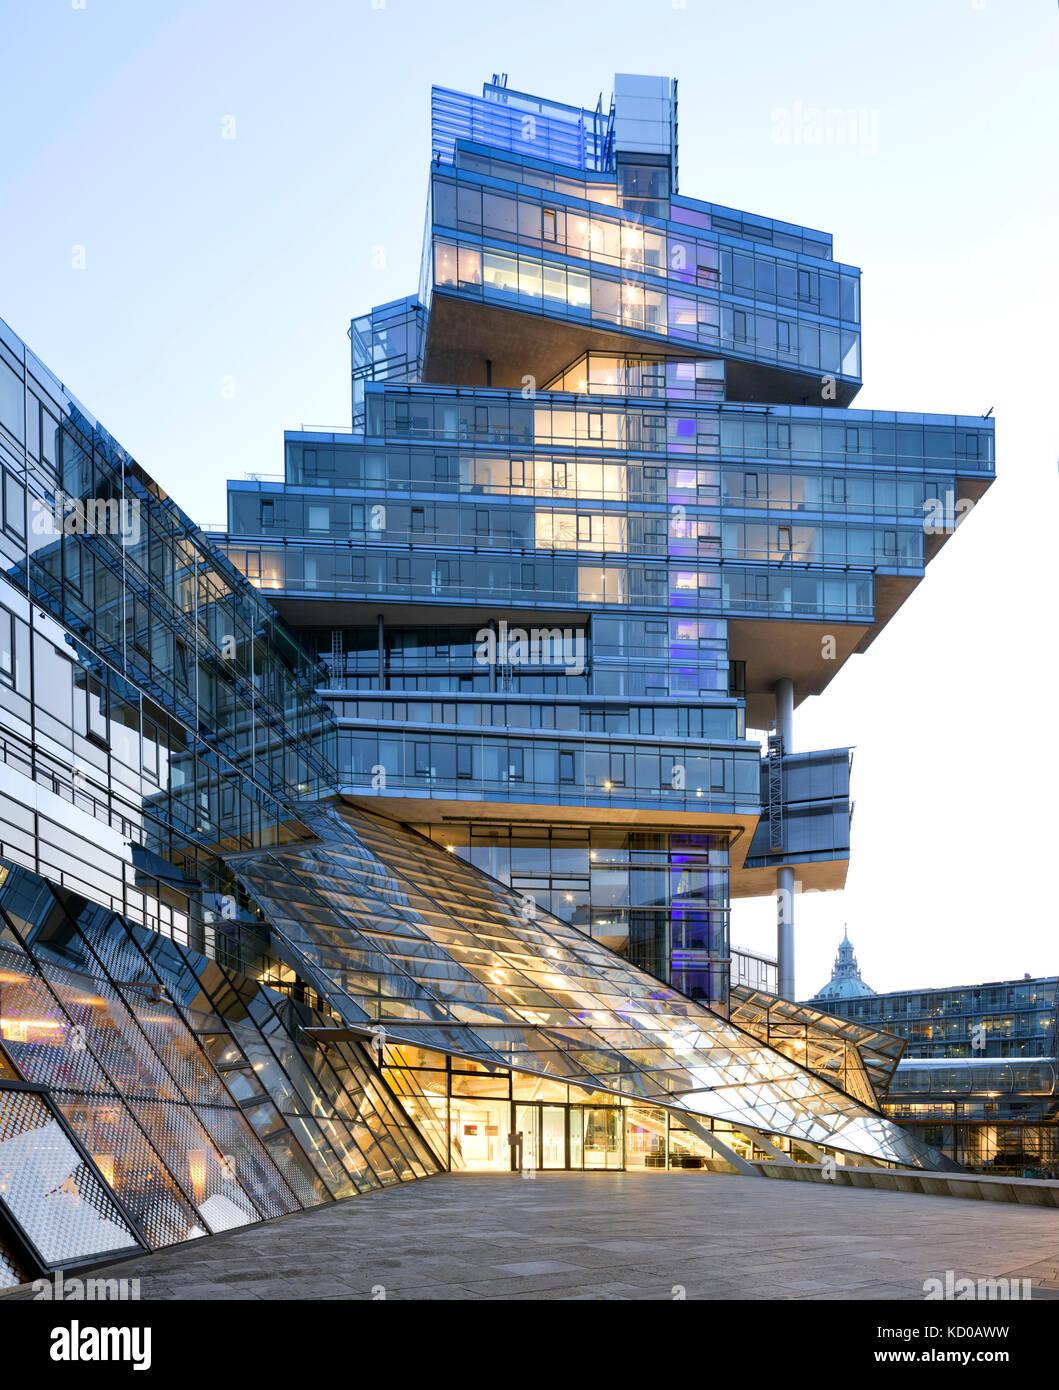 norddeutsche landesbank  nordlb  headquarters